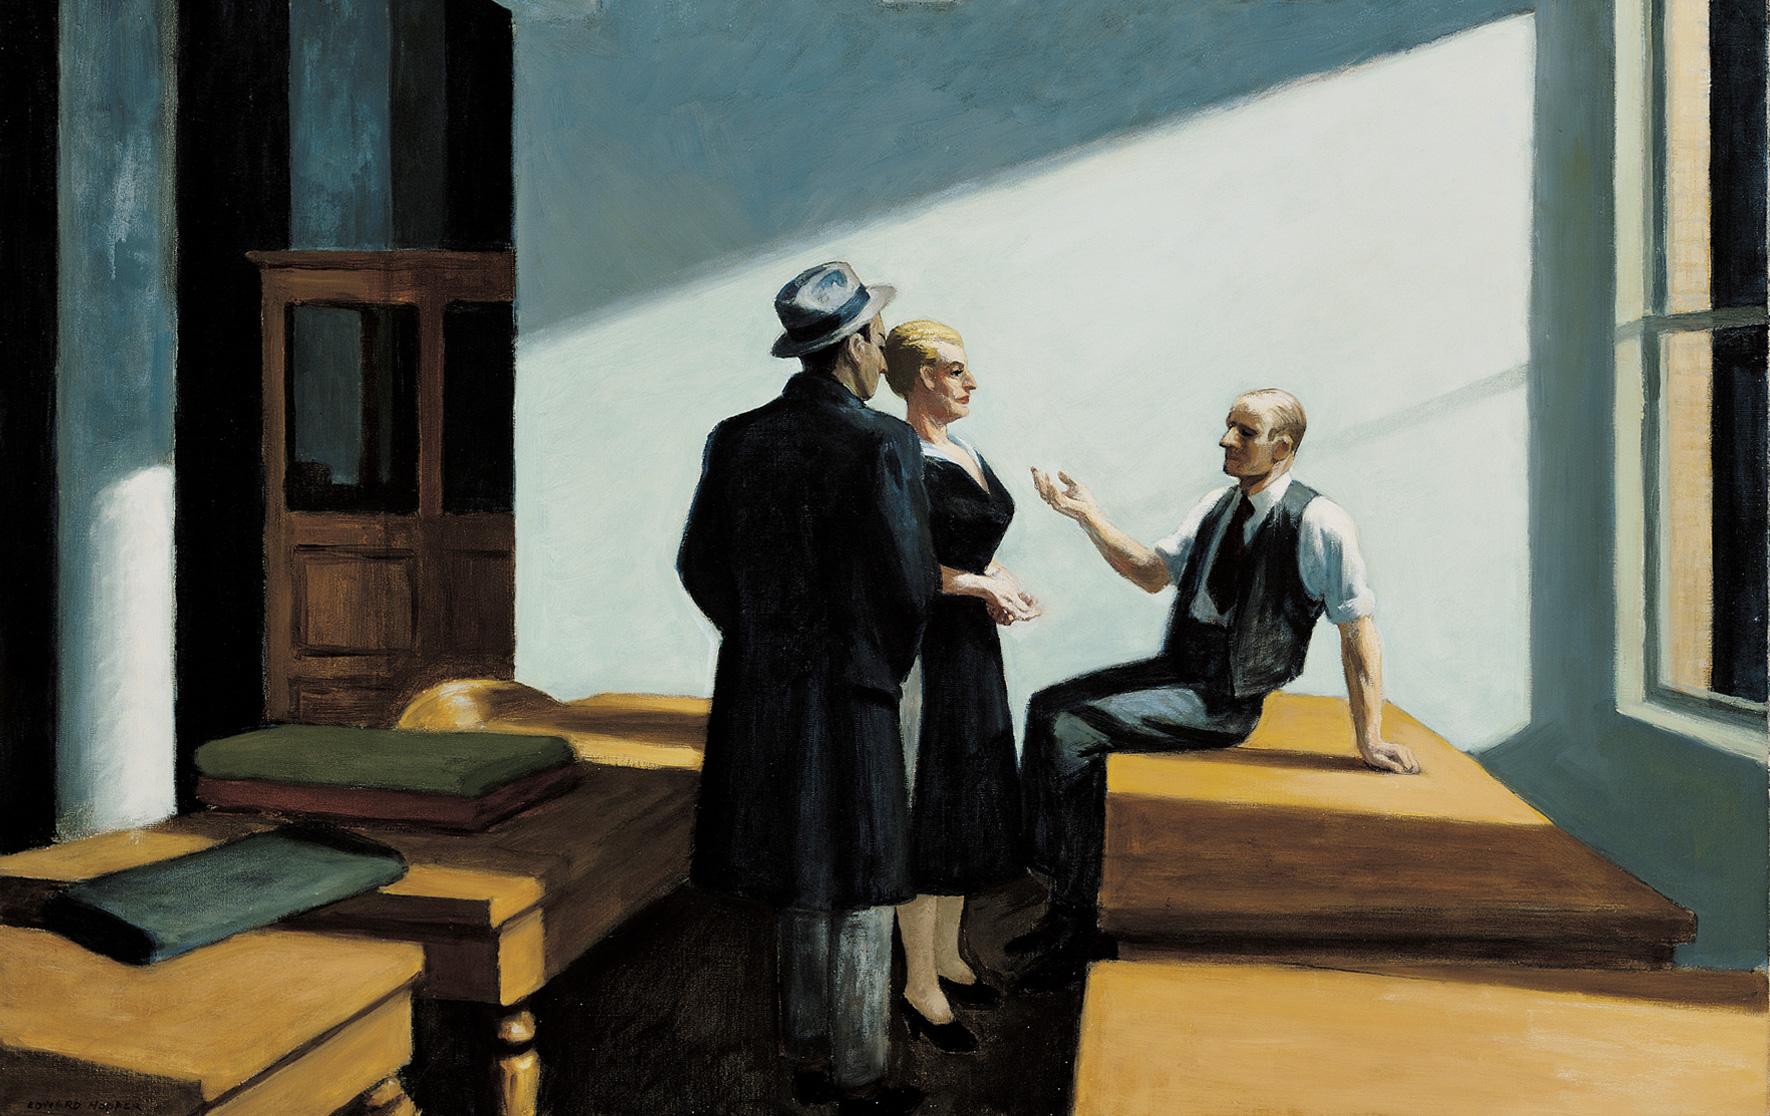 Conference at night. Edward Hopper, 1952.